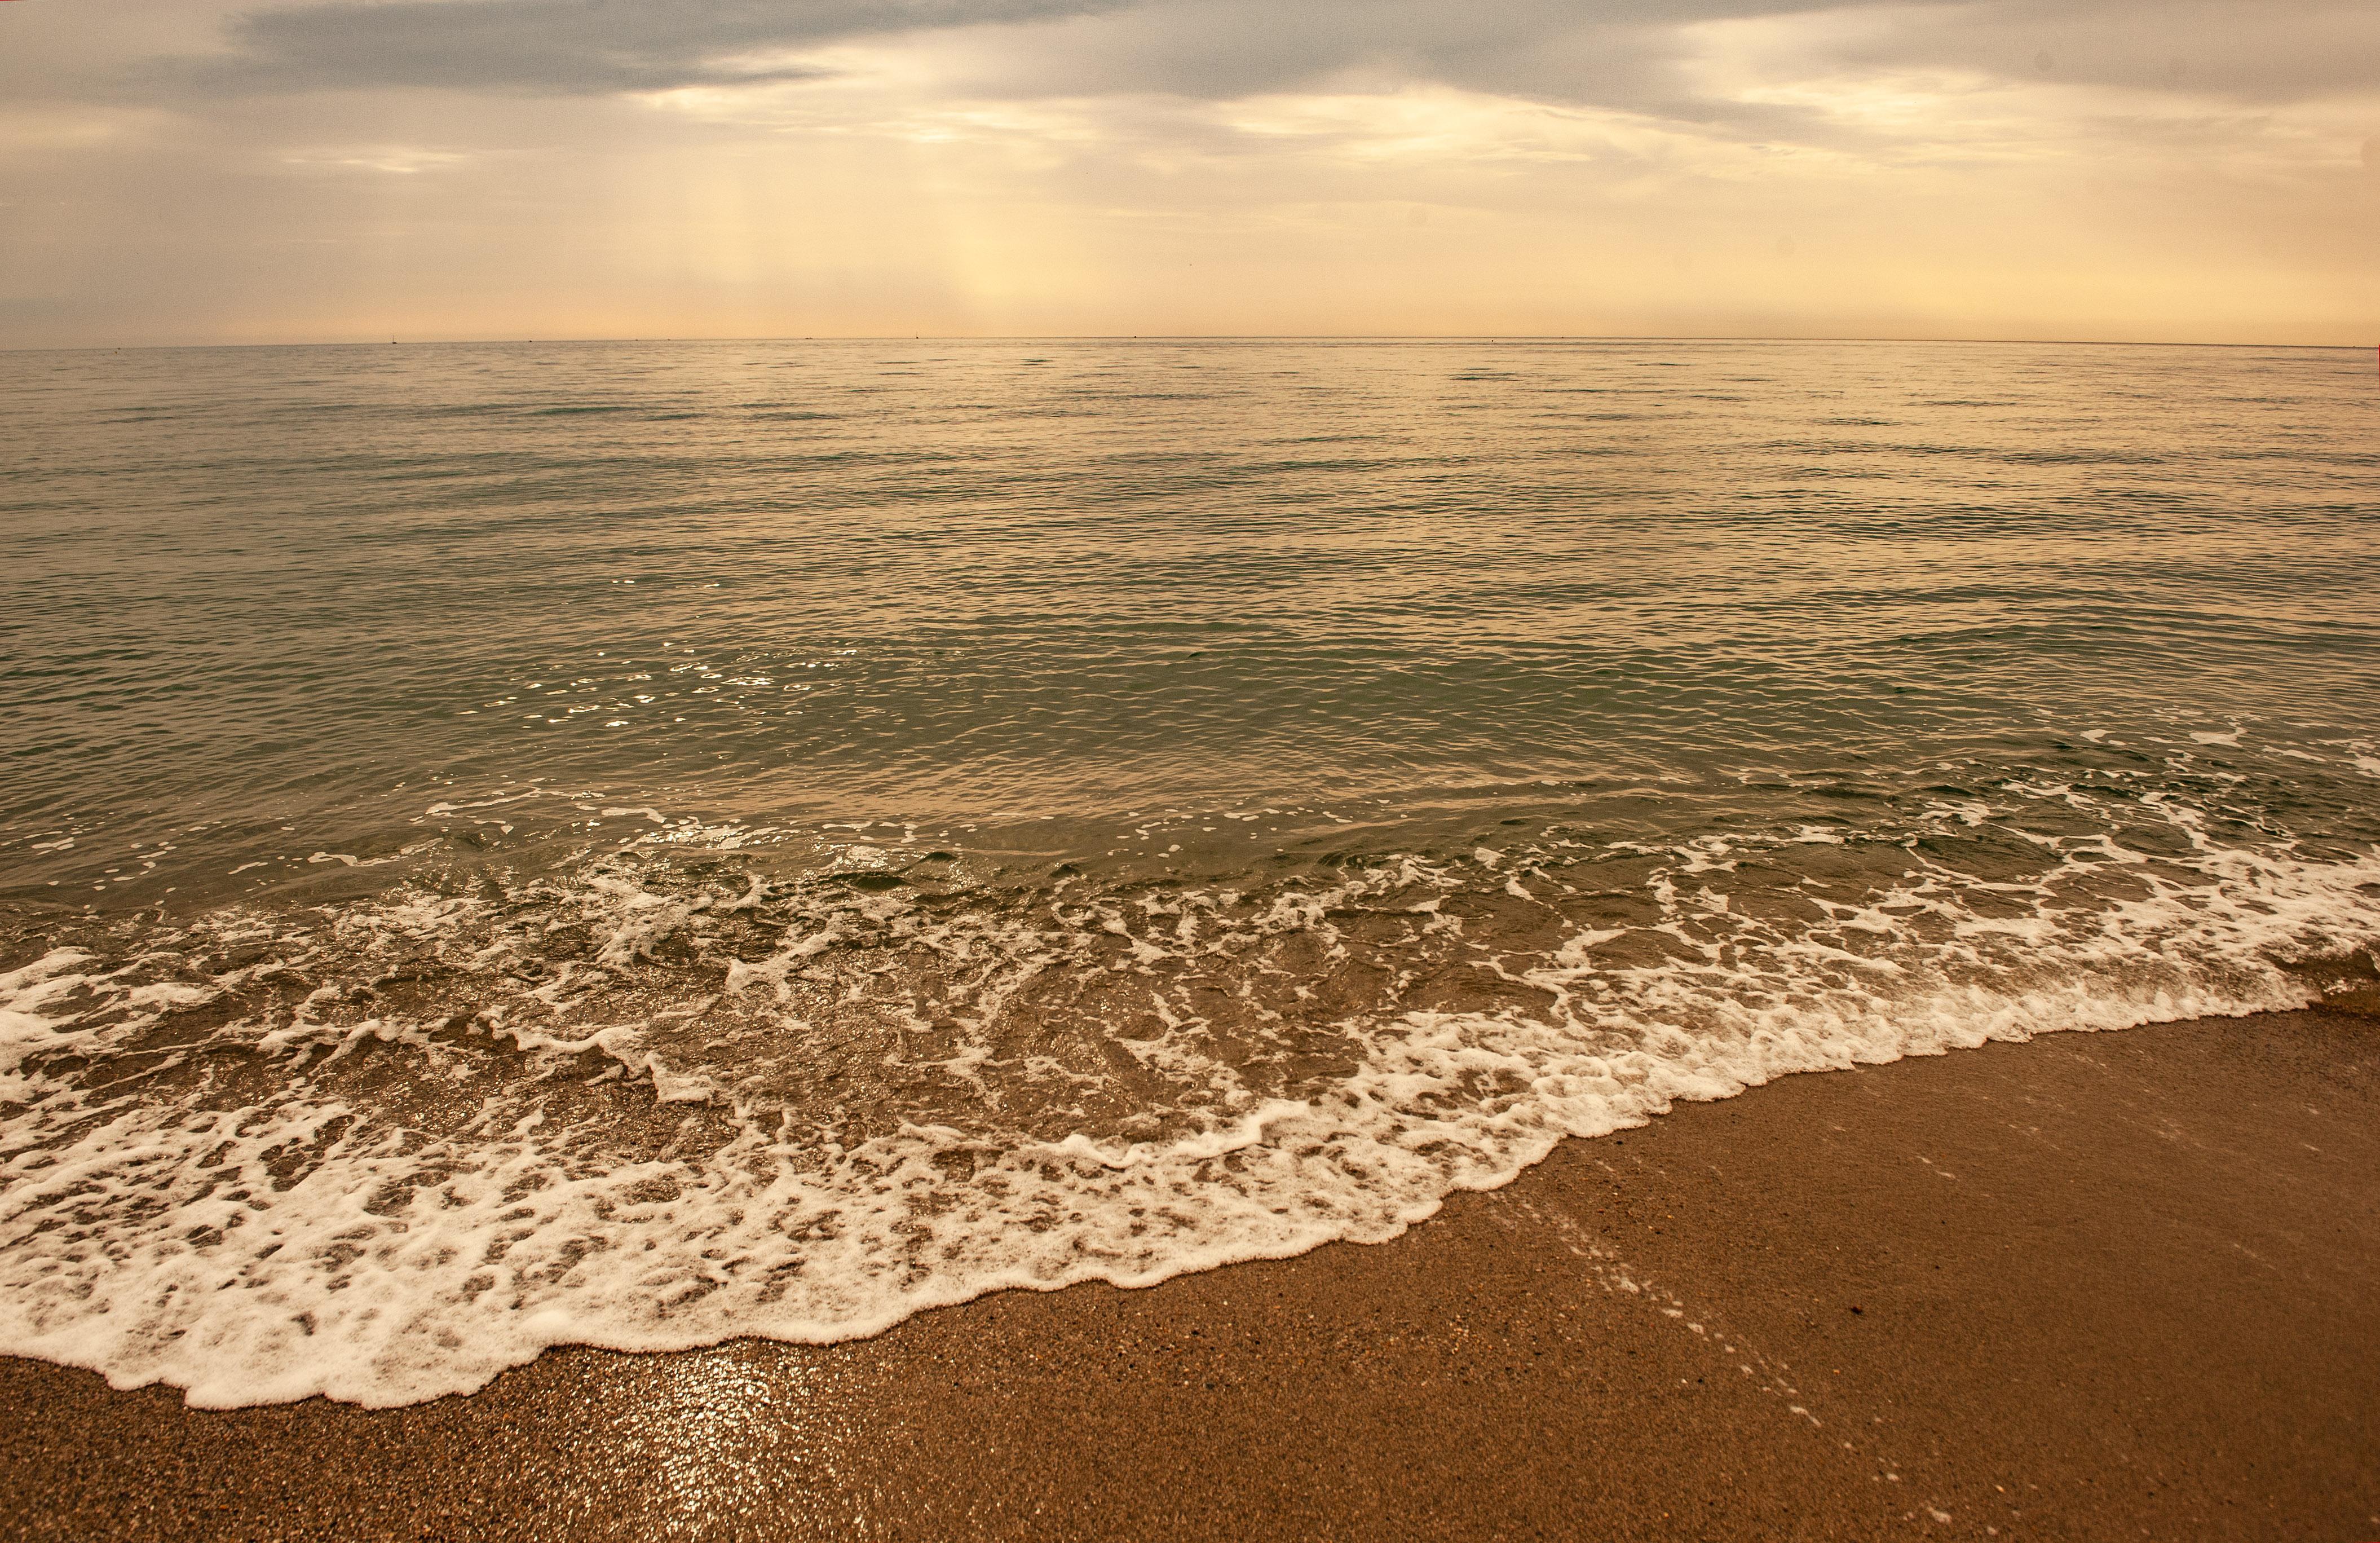 Glamping in Frankreich: Morgens am Strand von Cant-Plage. Foto: Hilke Maunder